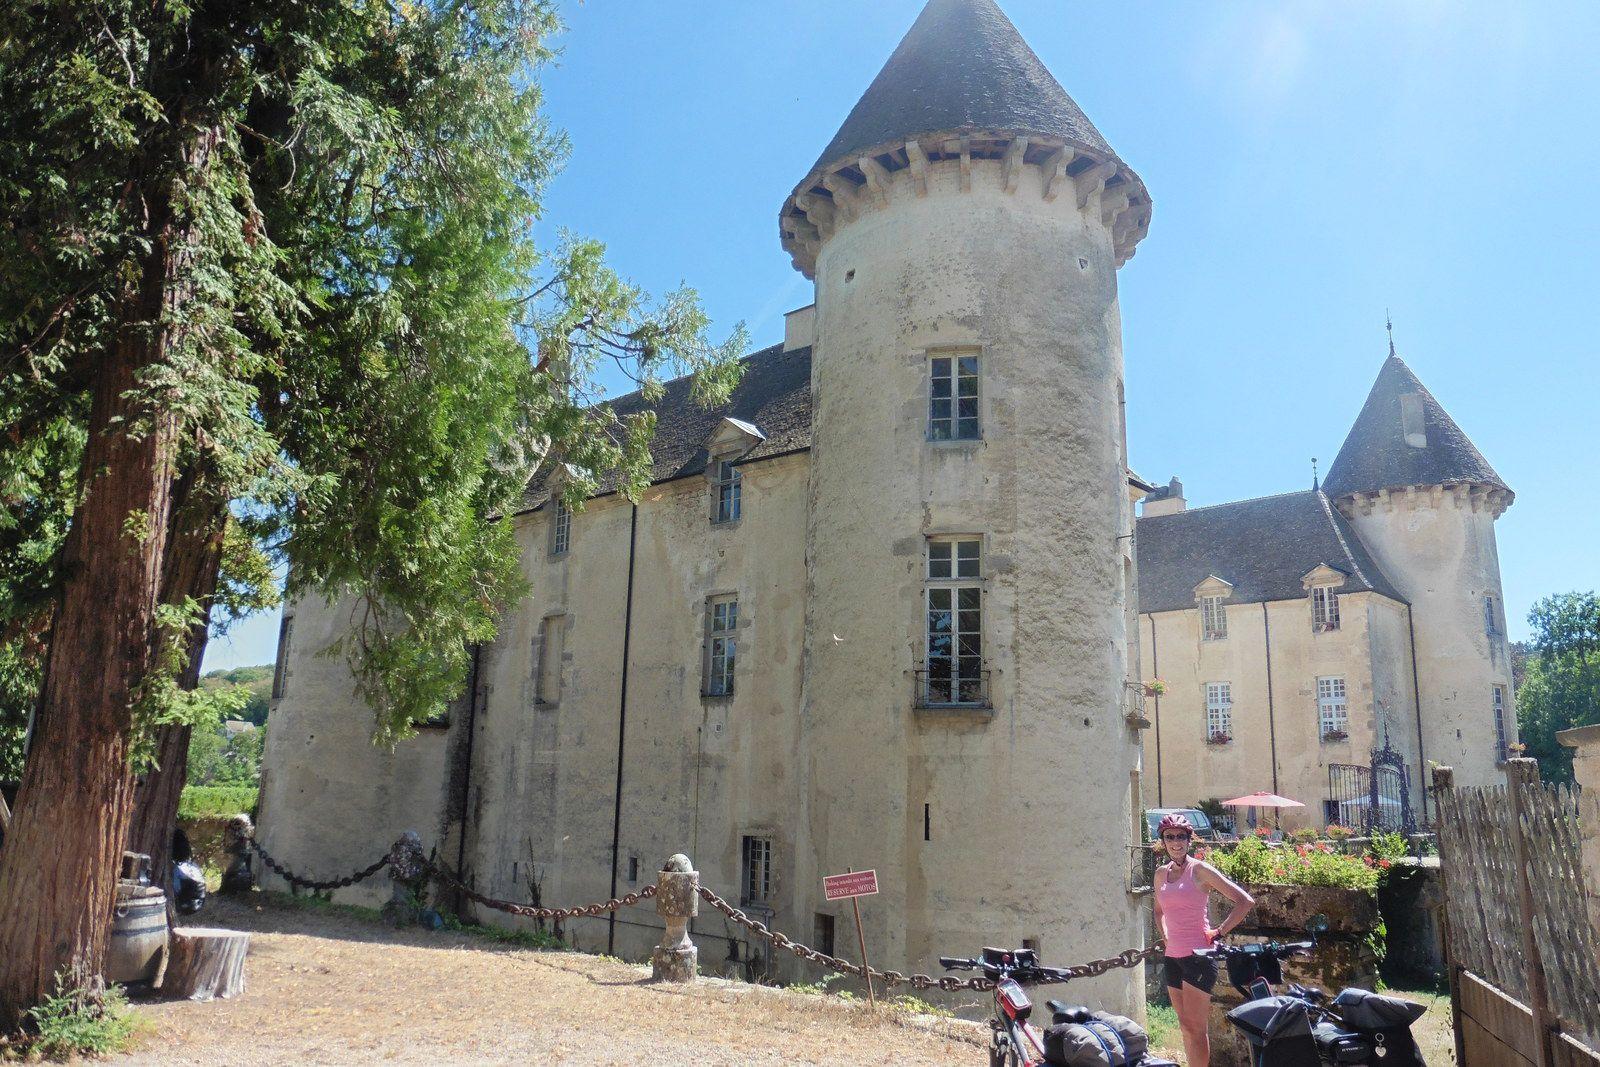 Le Tour de Bourgogne - Etape 4 - Dijon/ Santenay - 72,5 km